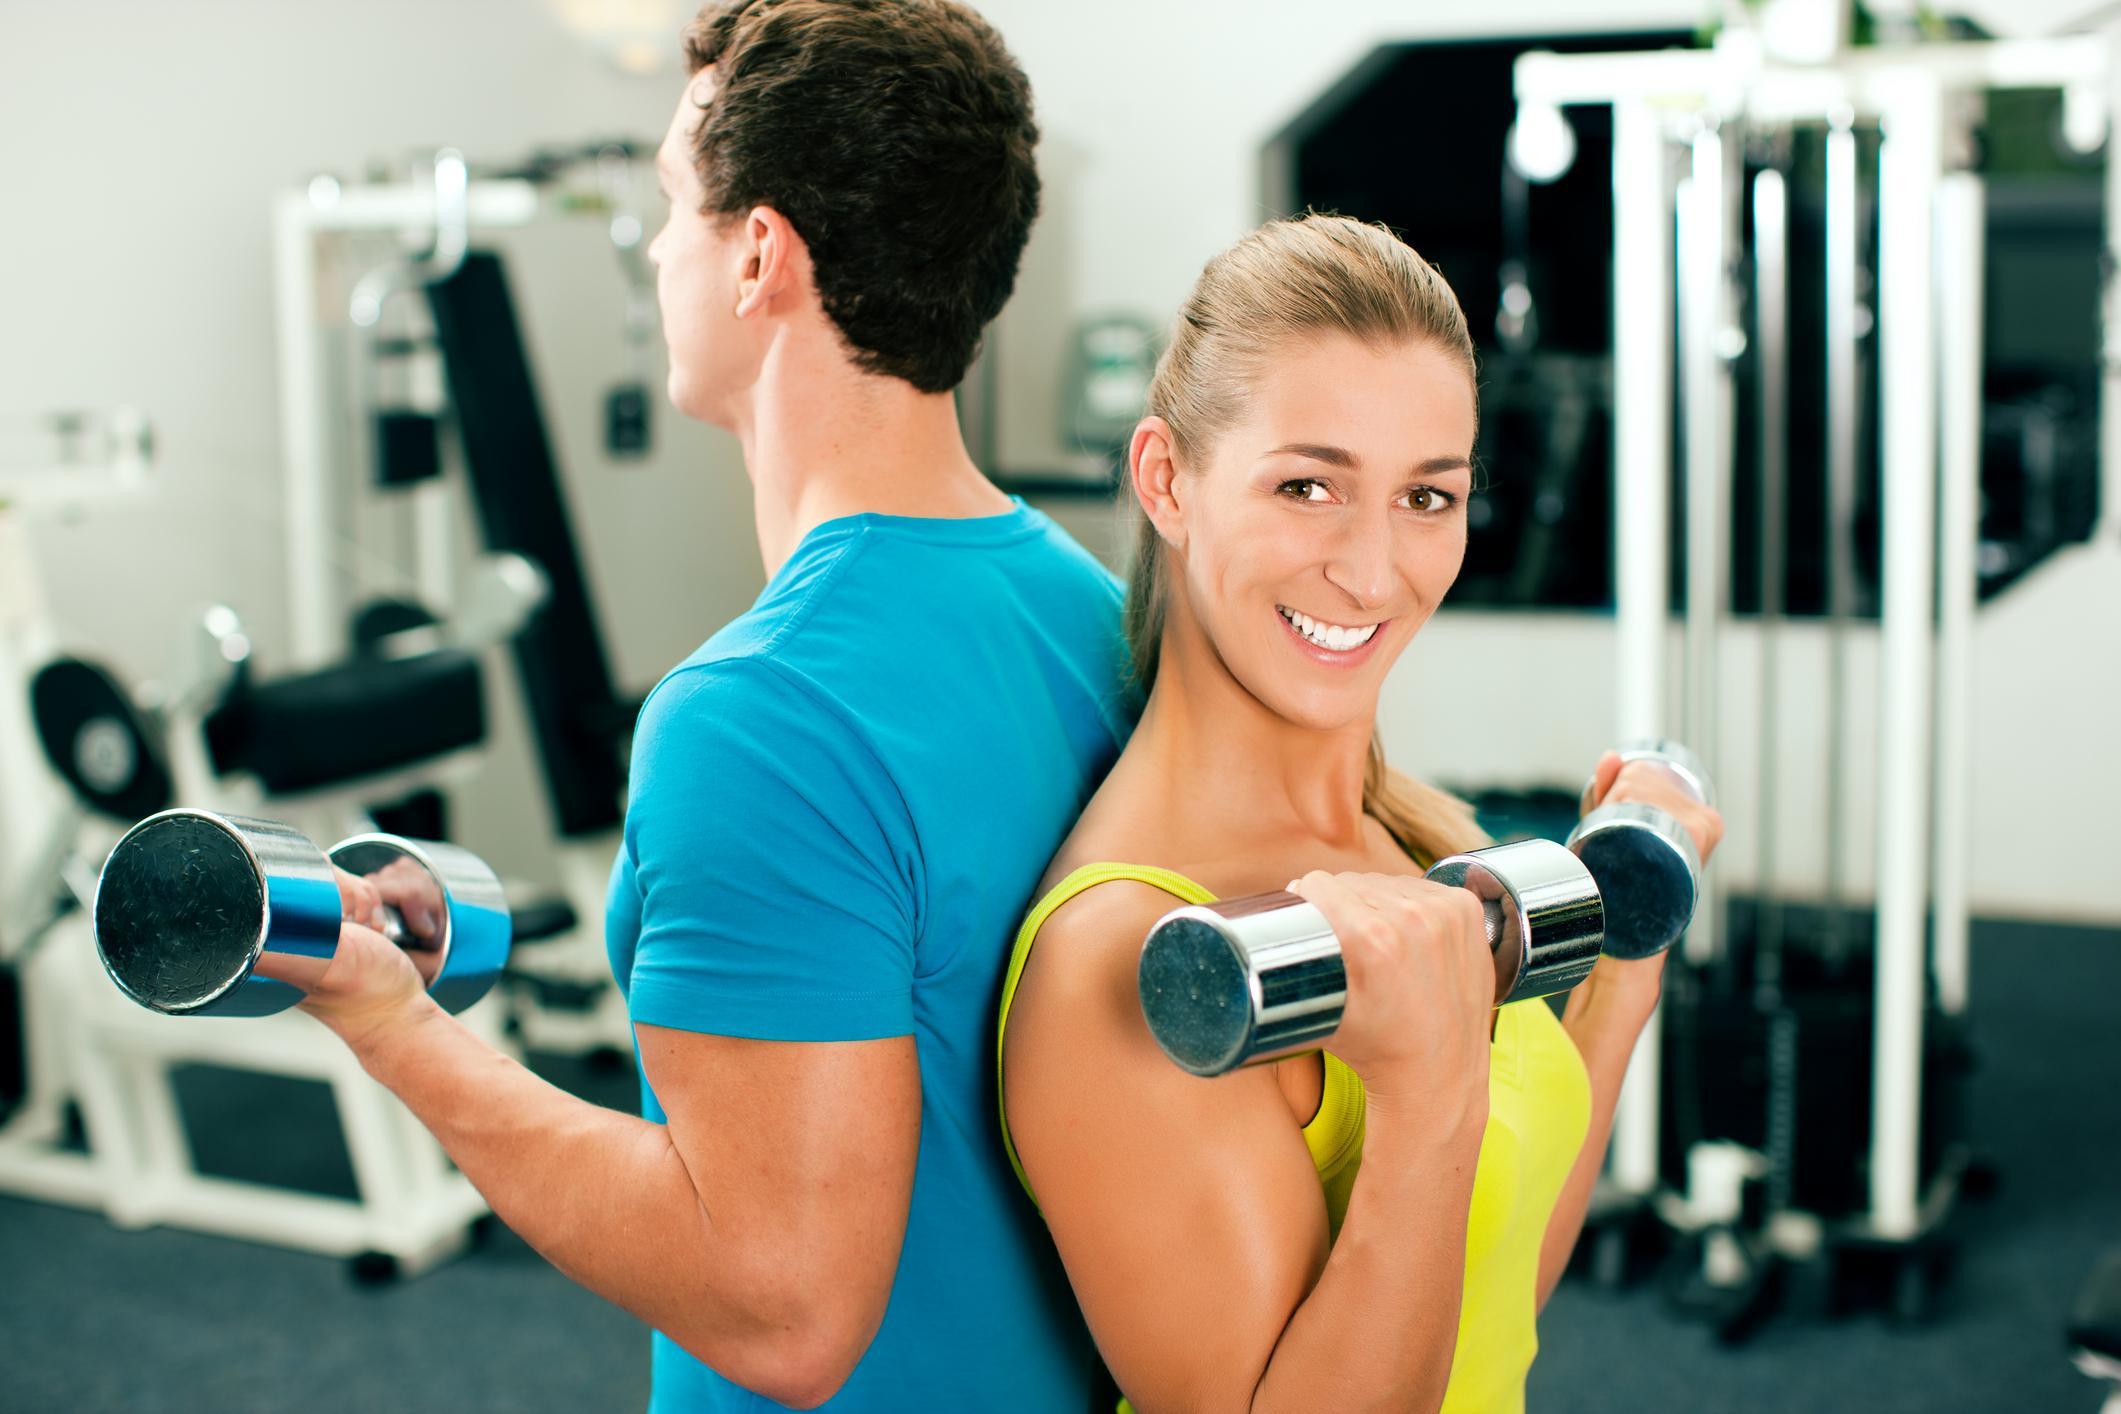 Pilates Fitness Exercise Classes Time Table in South Dublin Ireland Nutgrove Dublin 14 16 Dundrum